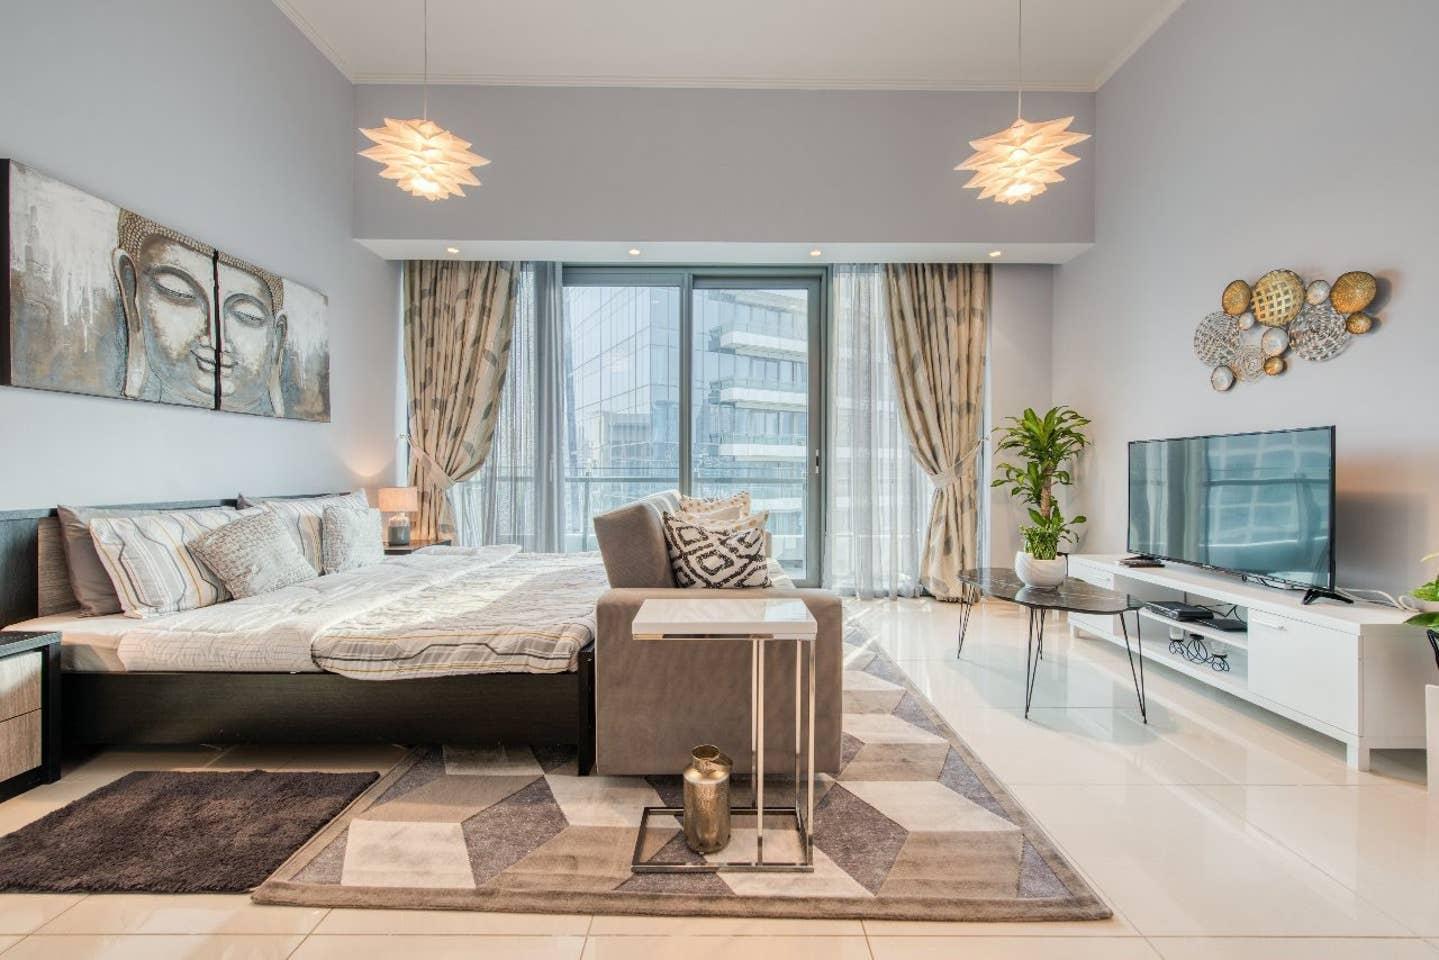 Best Dubai Airbnb 2020